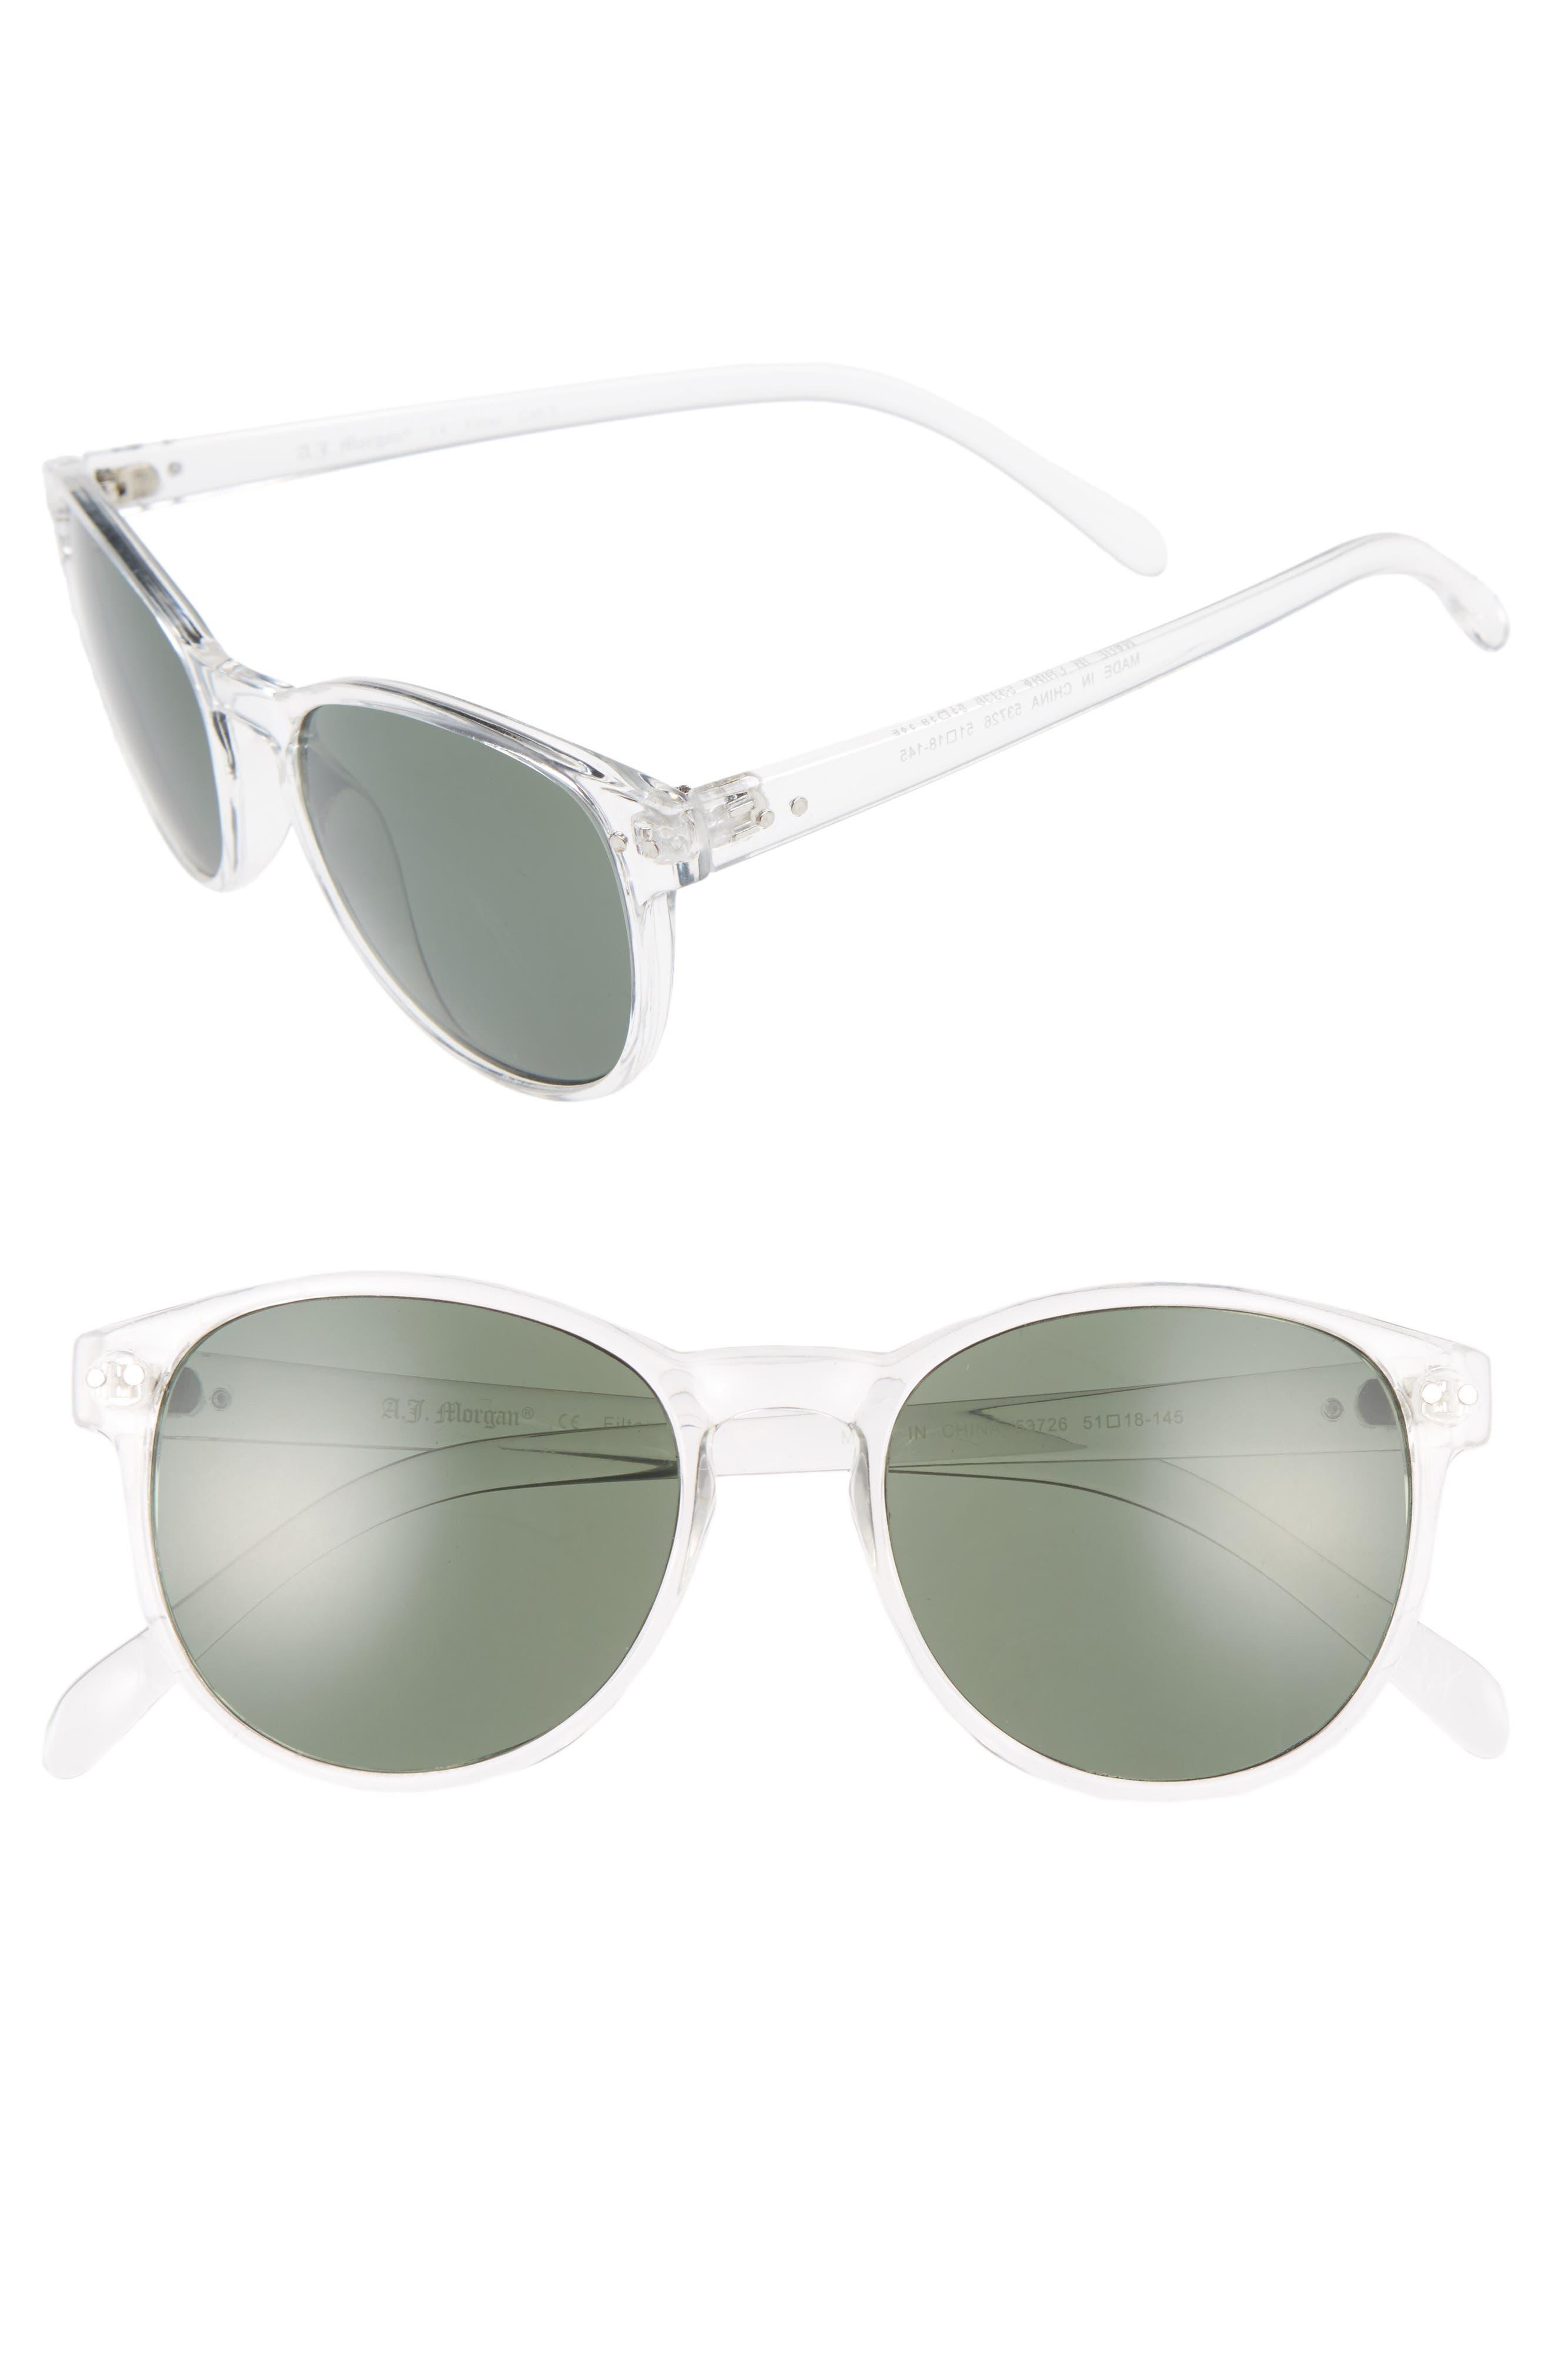 Daily 57mm Sunglasses,                             Main thumbnail 1, color,                             100